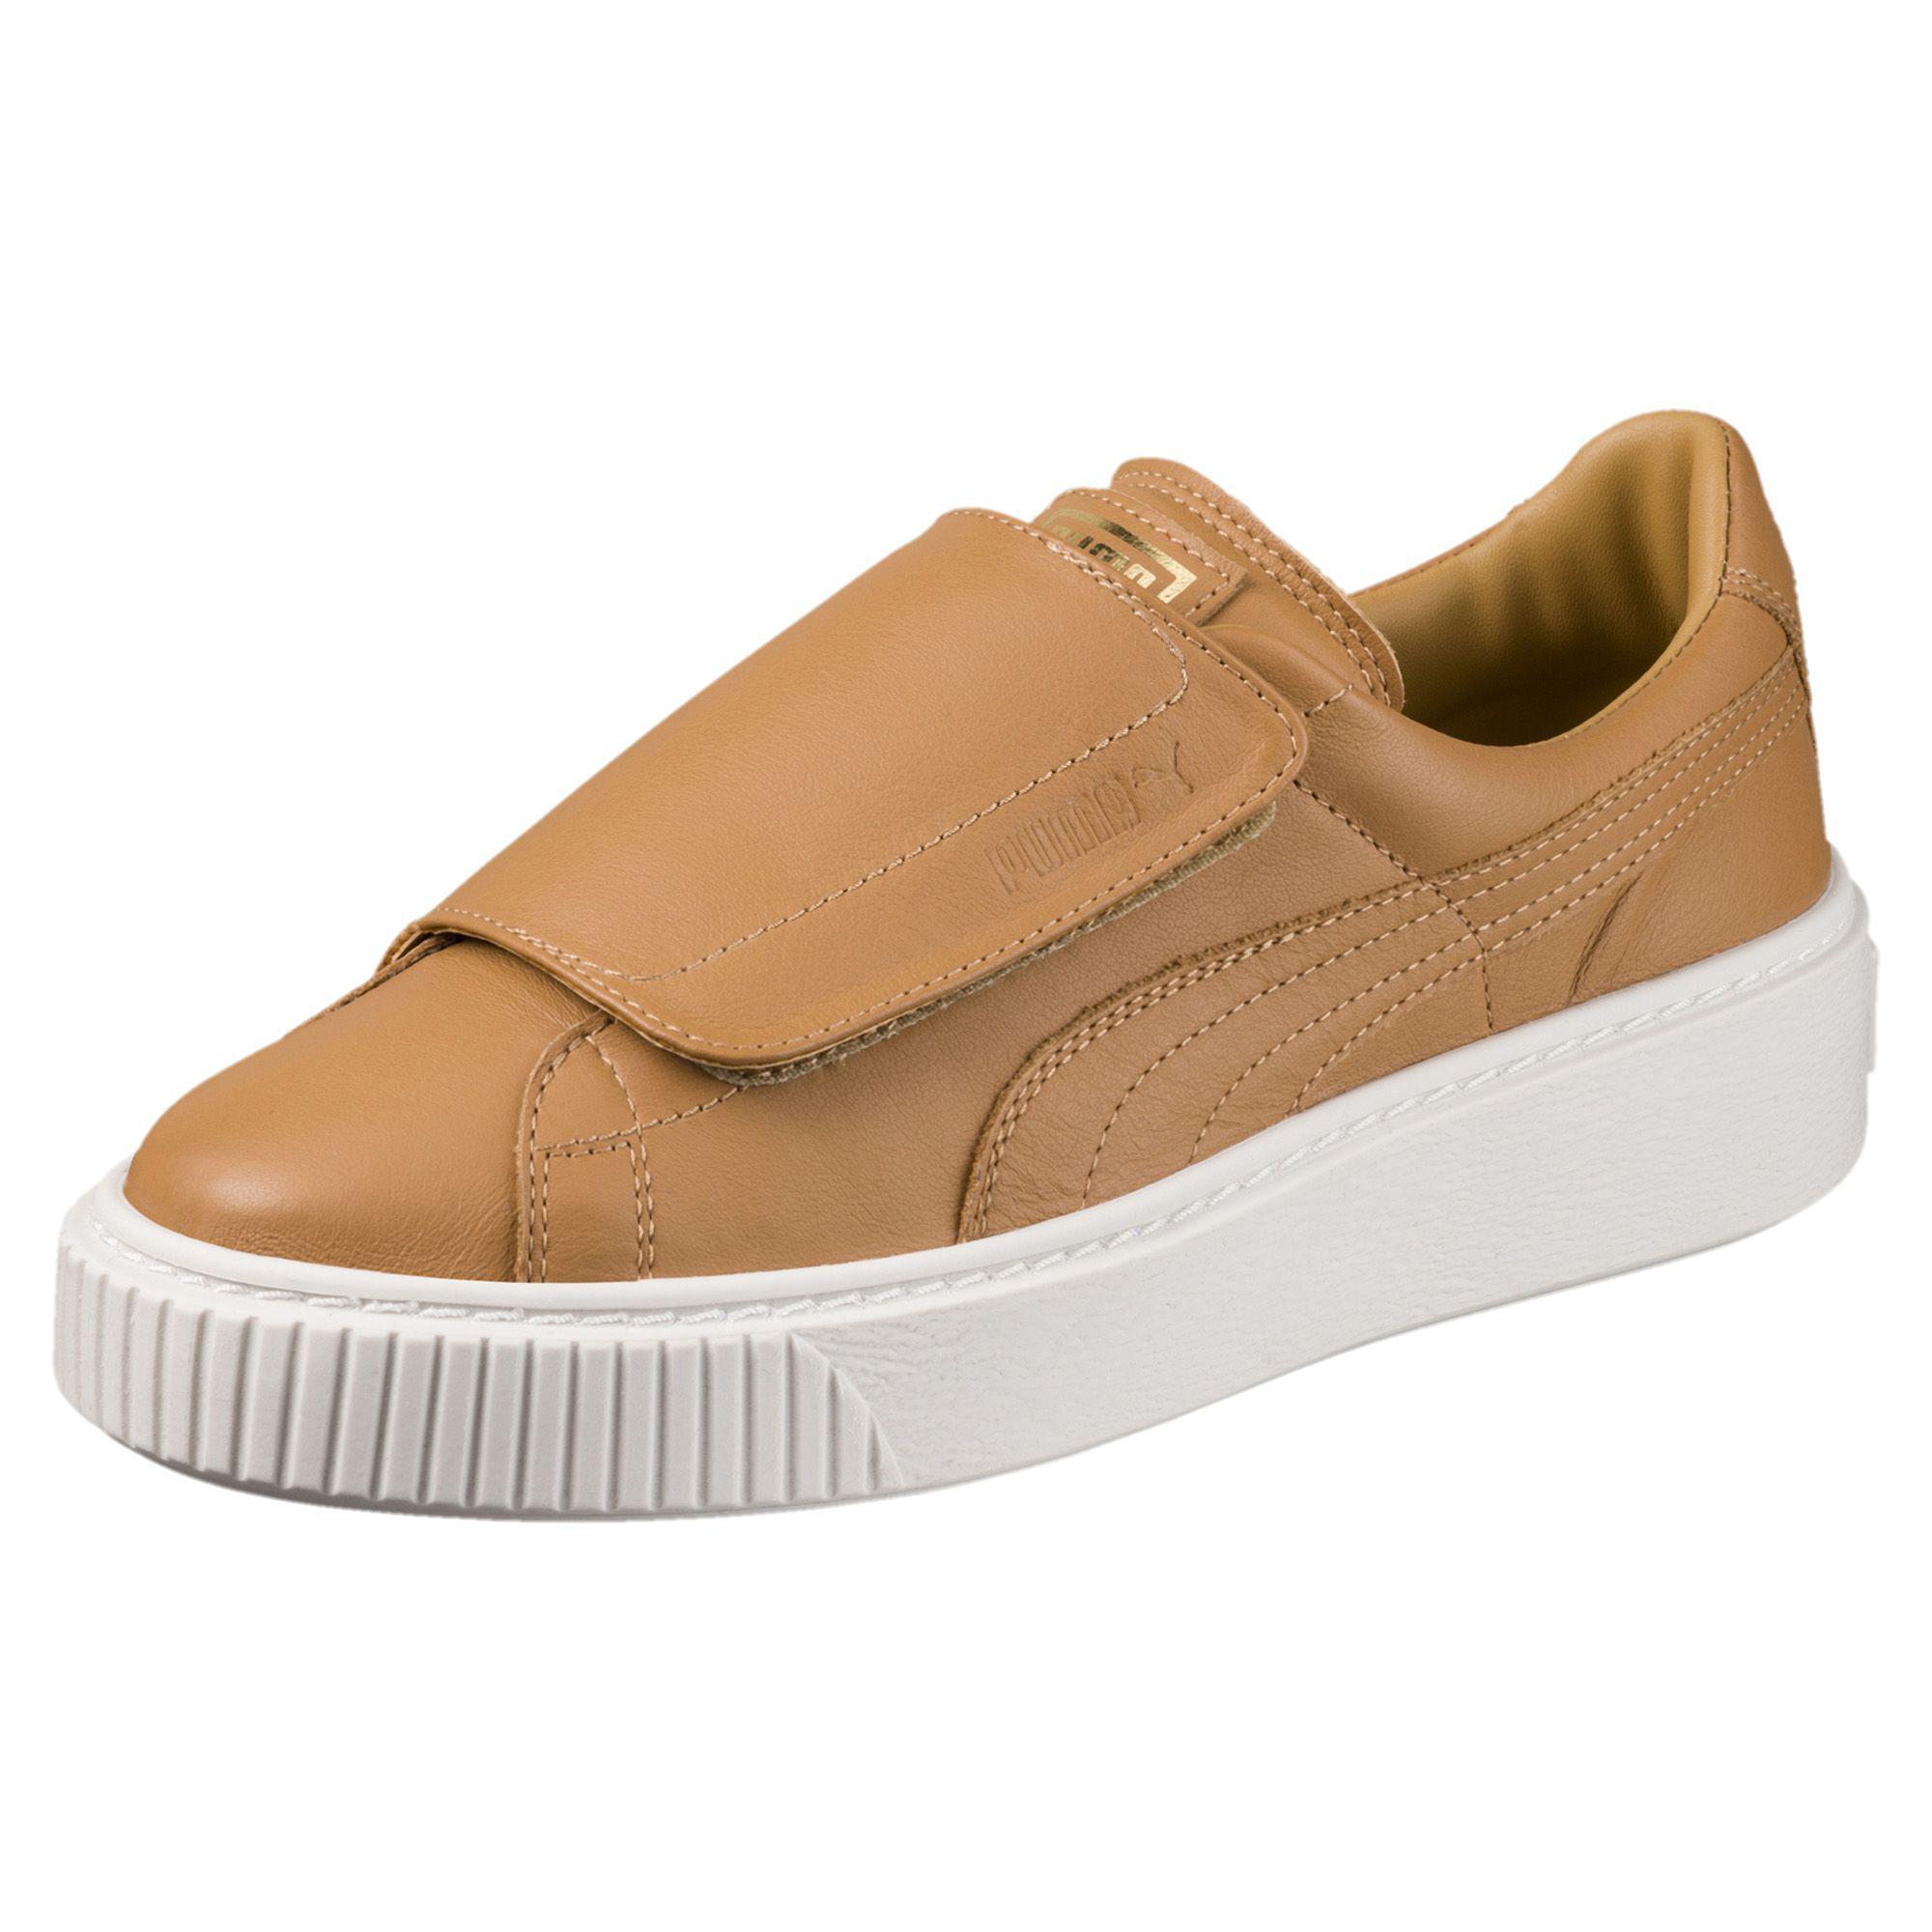 63db08aa3261 Gallery. Women s Platform Sneakers Women s Sperry Top ...